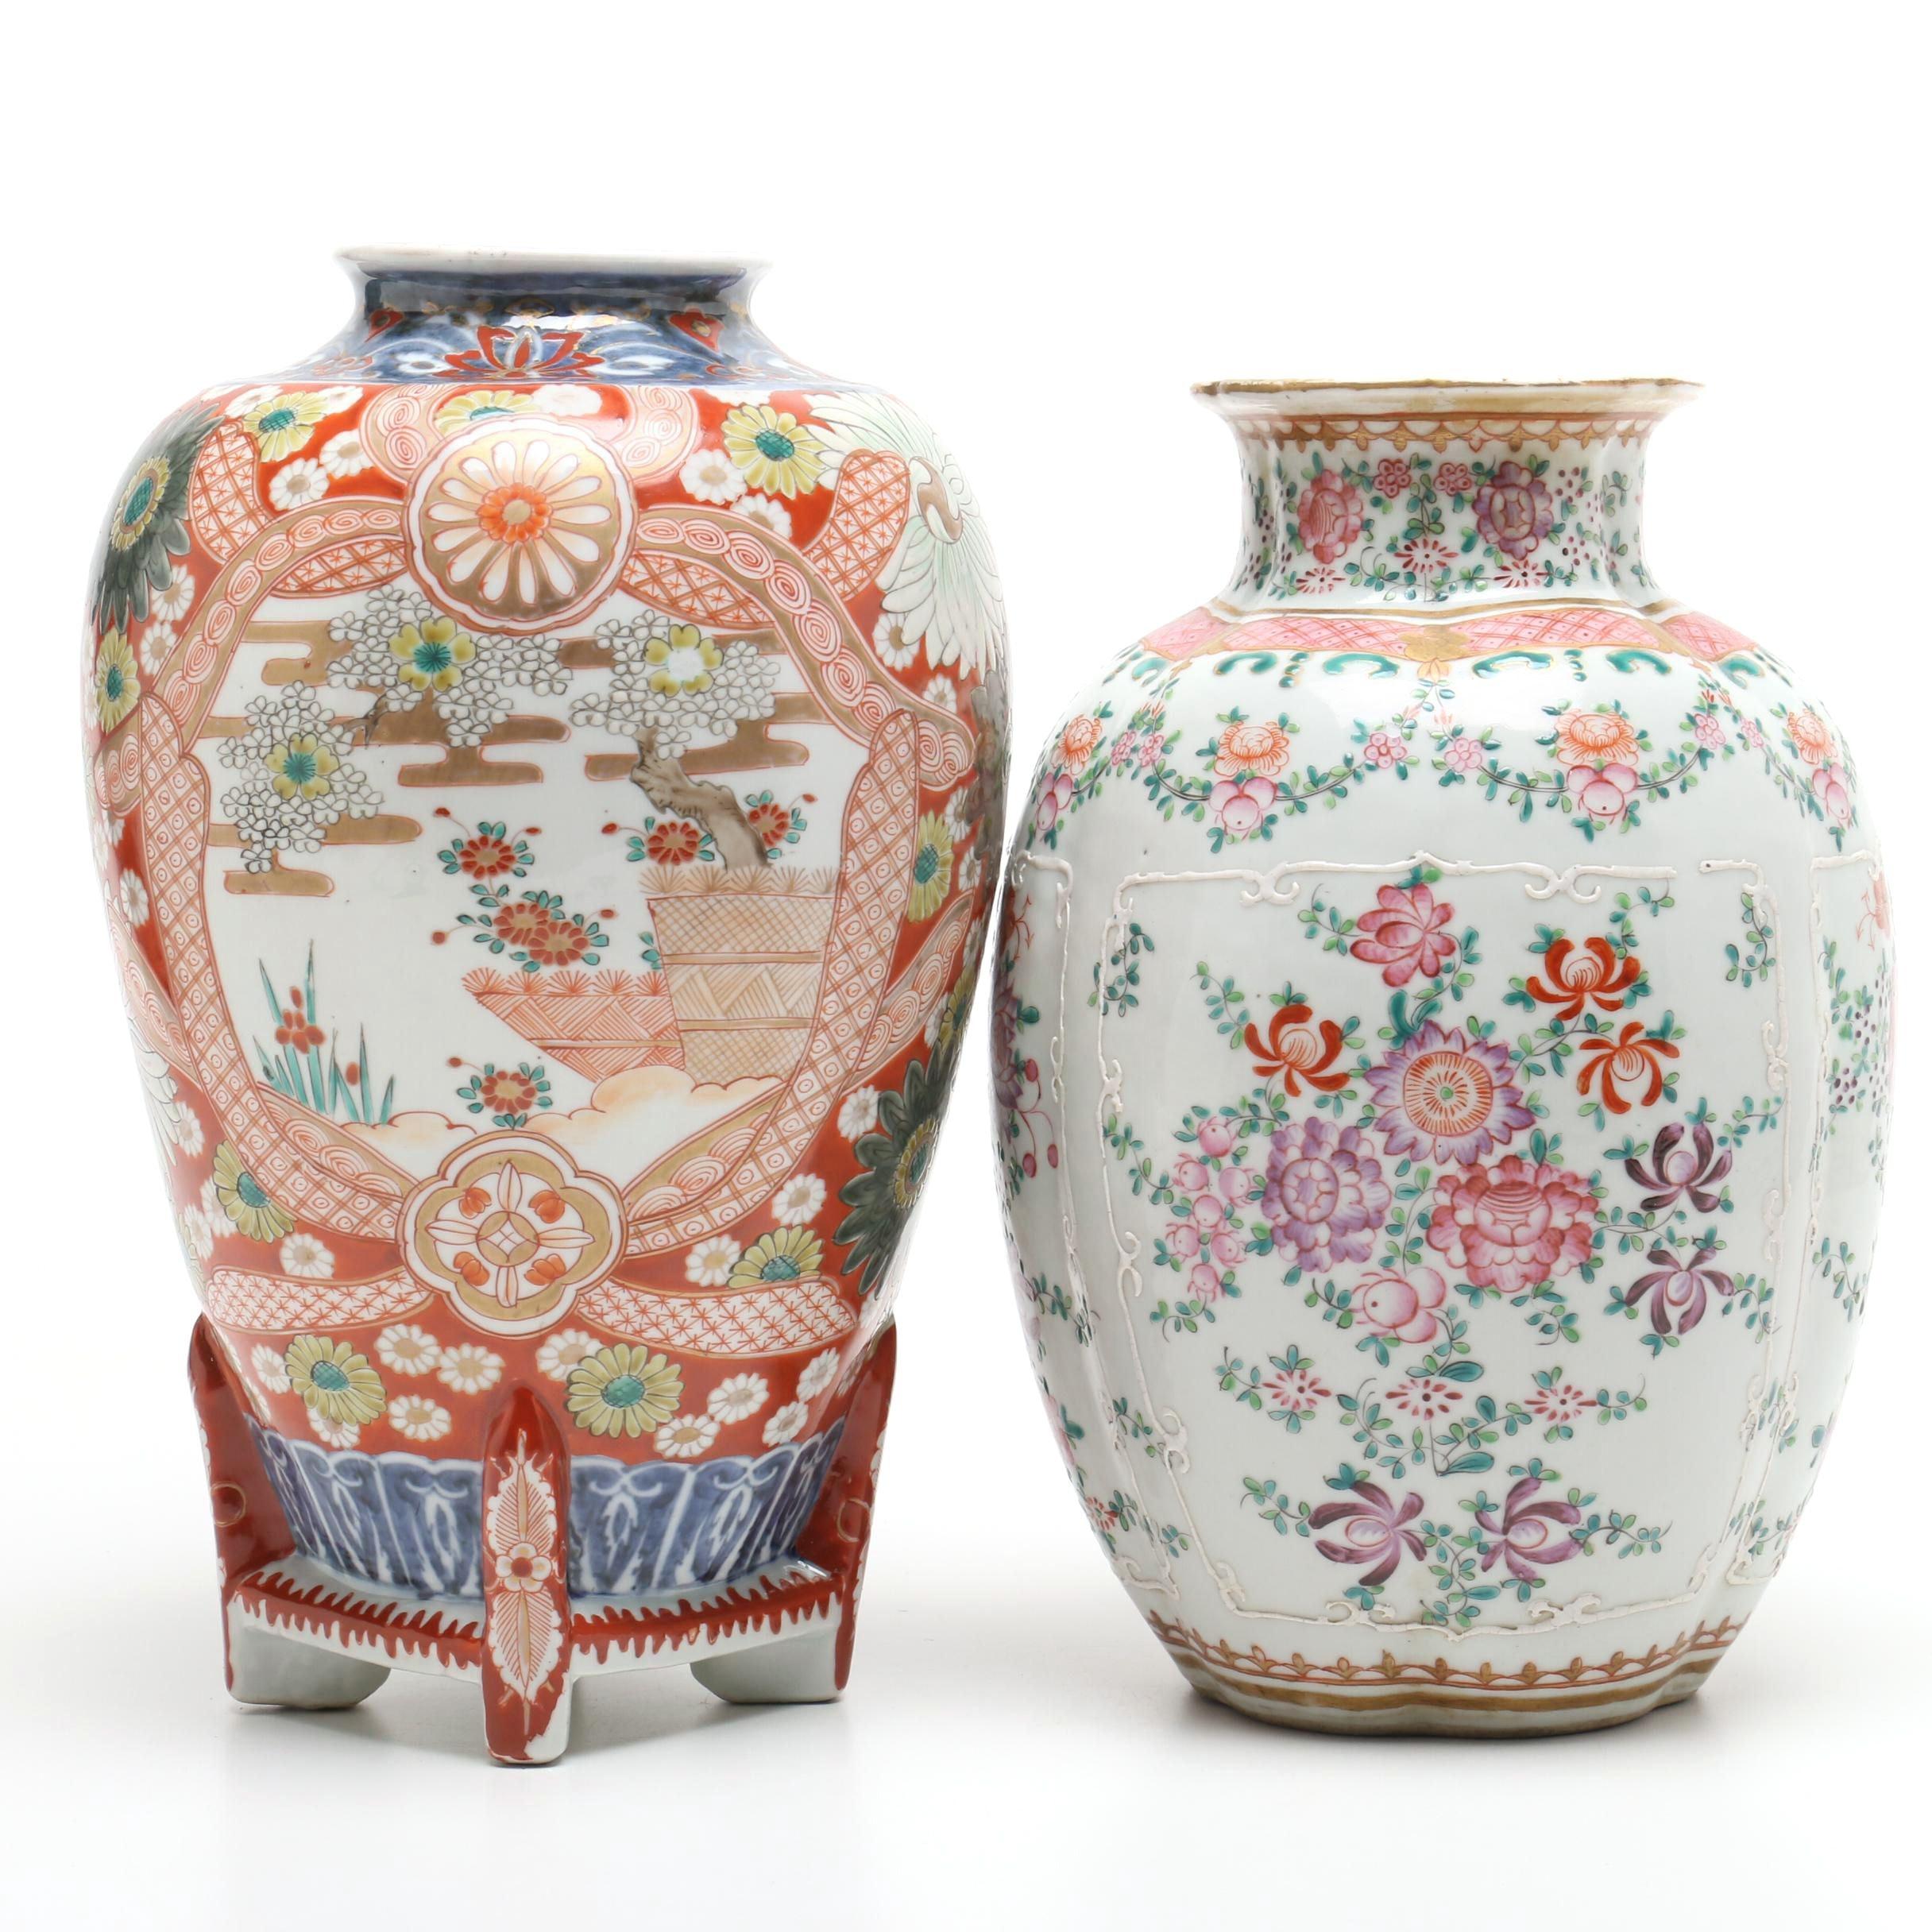 Chinese and Japanese Porelain Vases